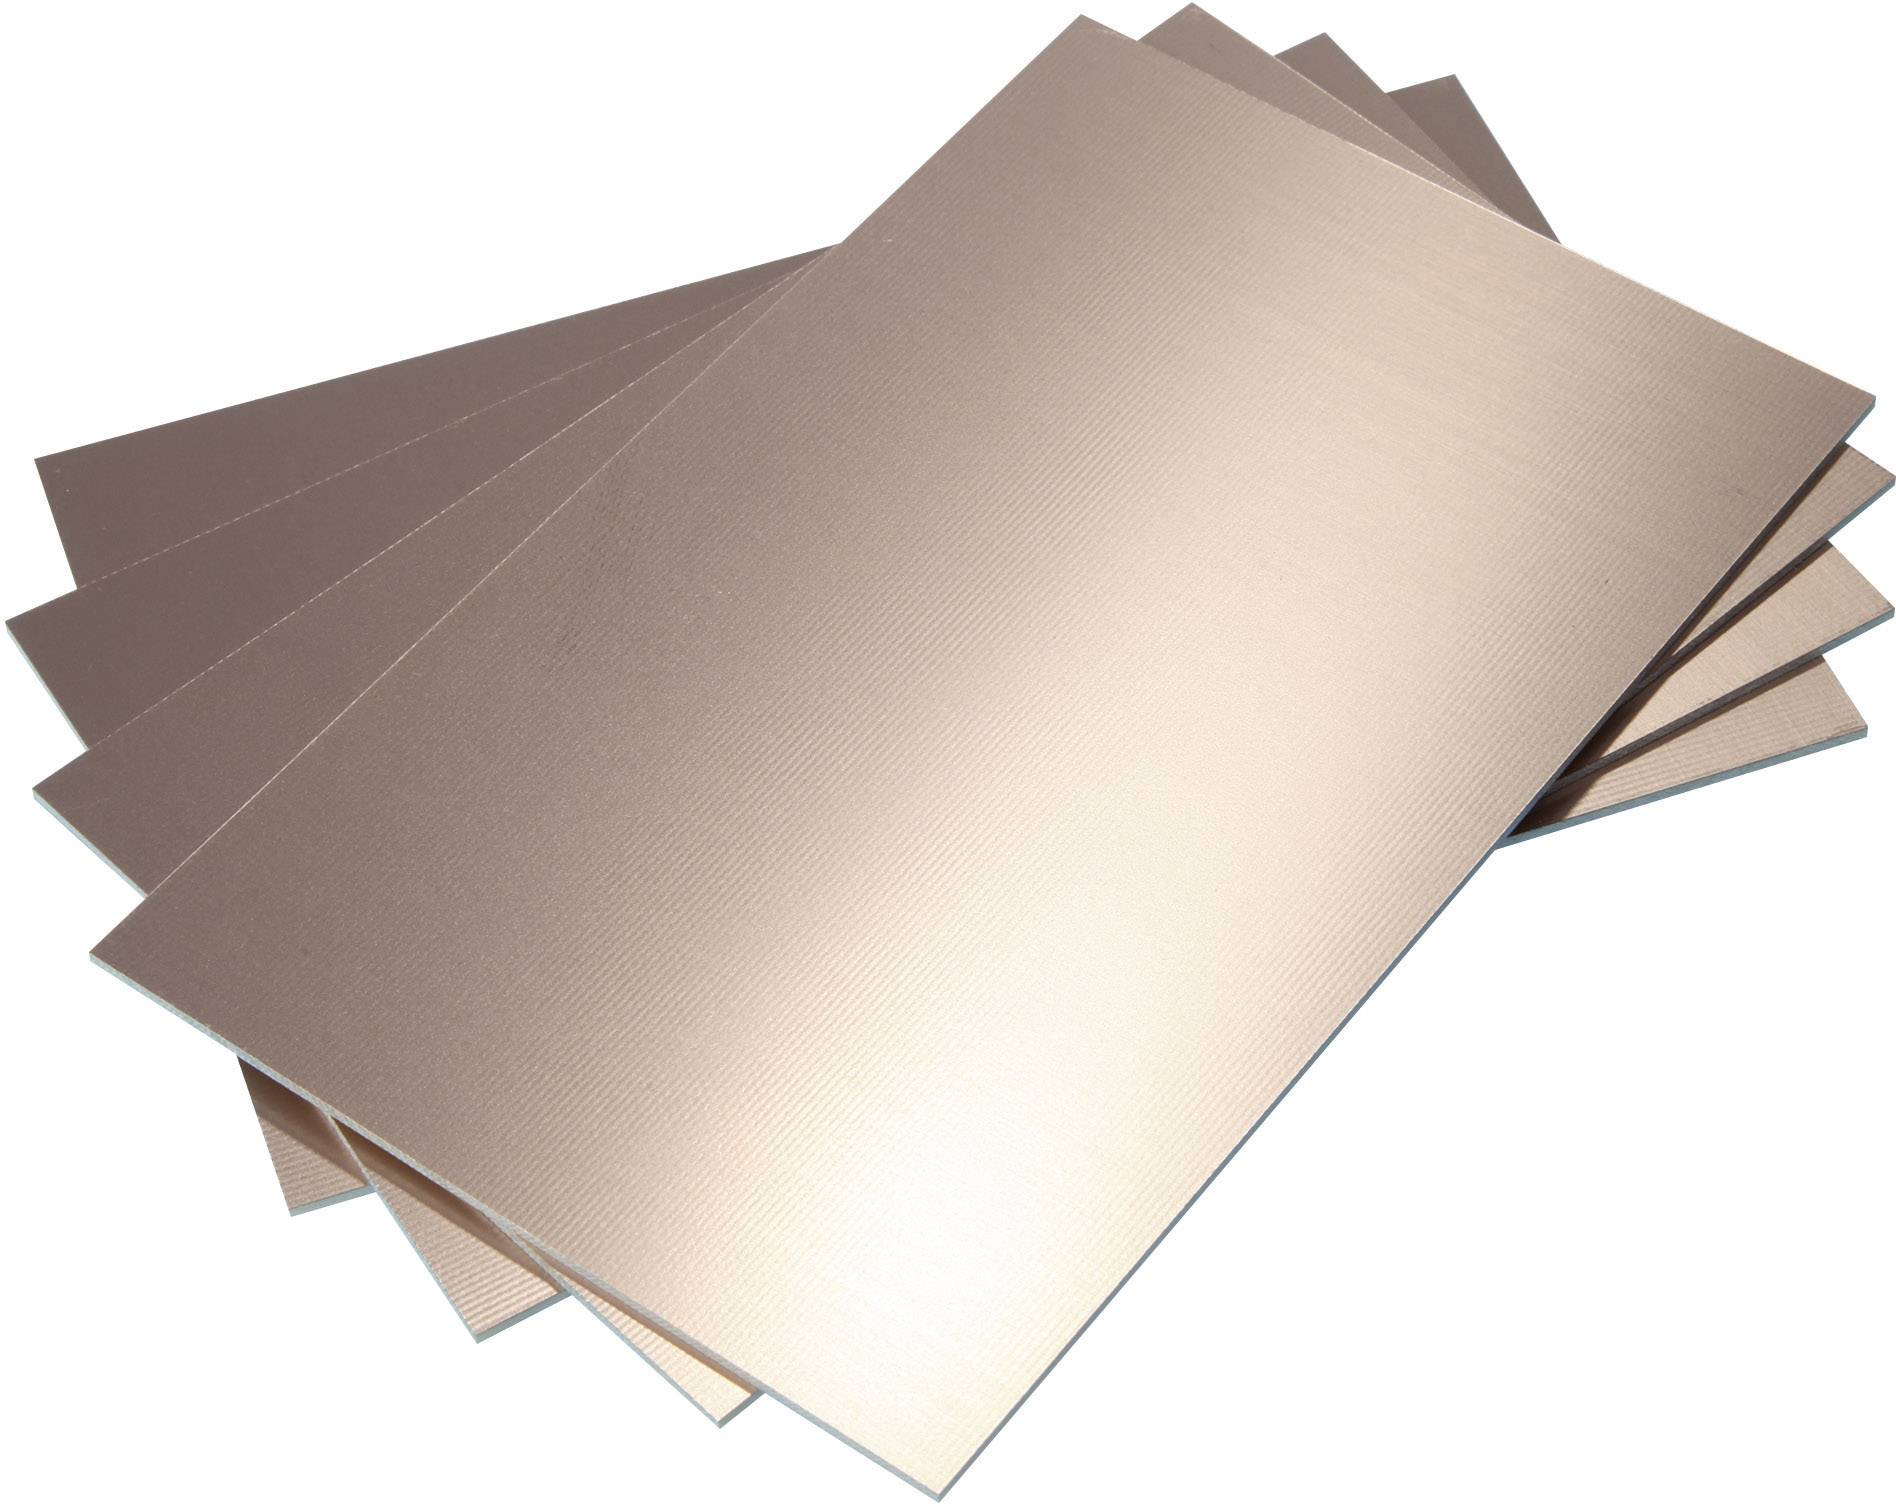 Základný materiál DPS Bungard 020306Z10-5, 35 µm, (d x š) 570 mm x 510 mm